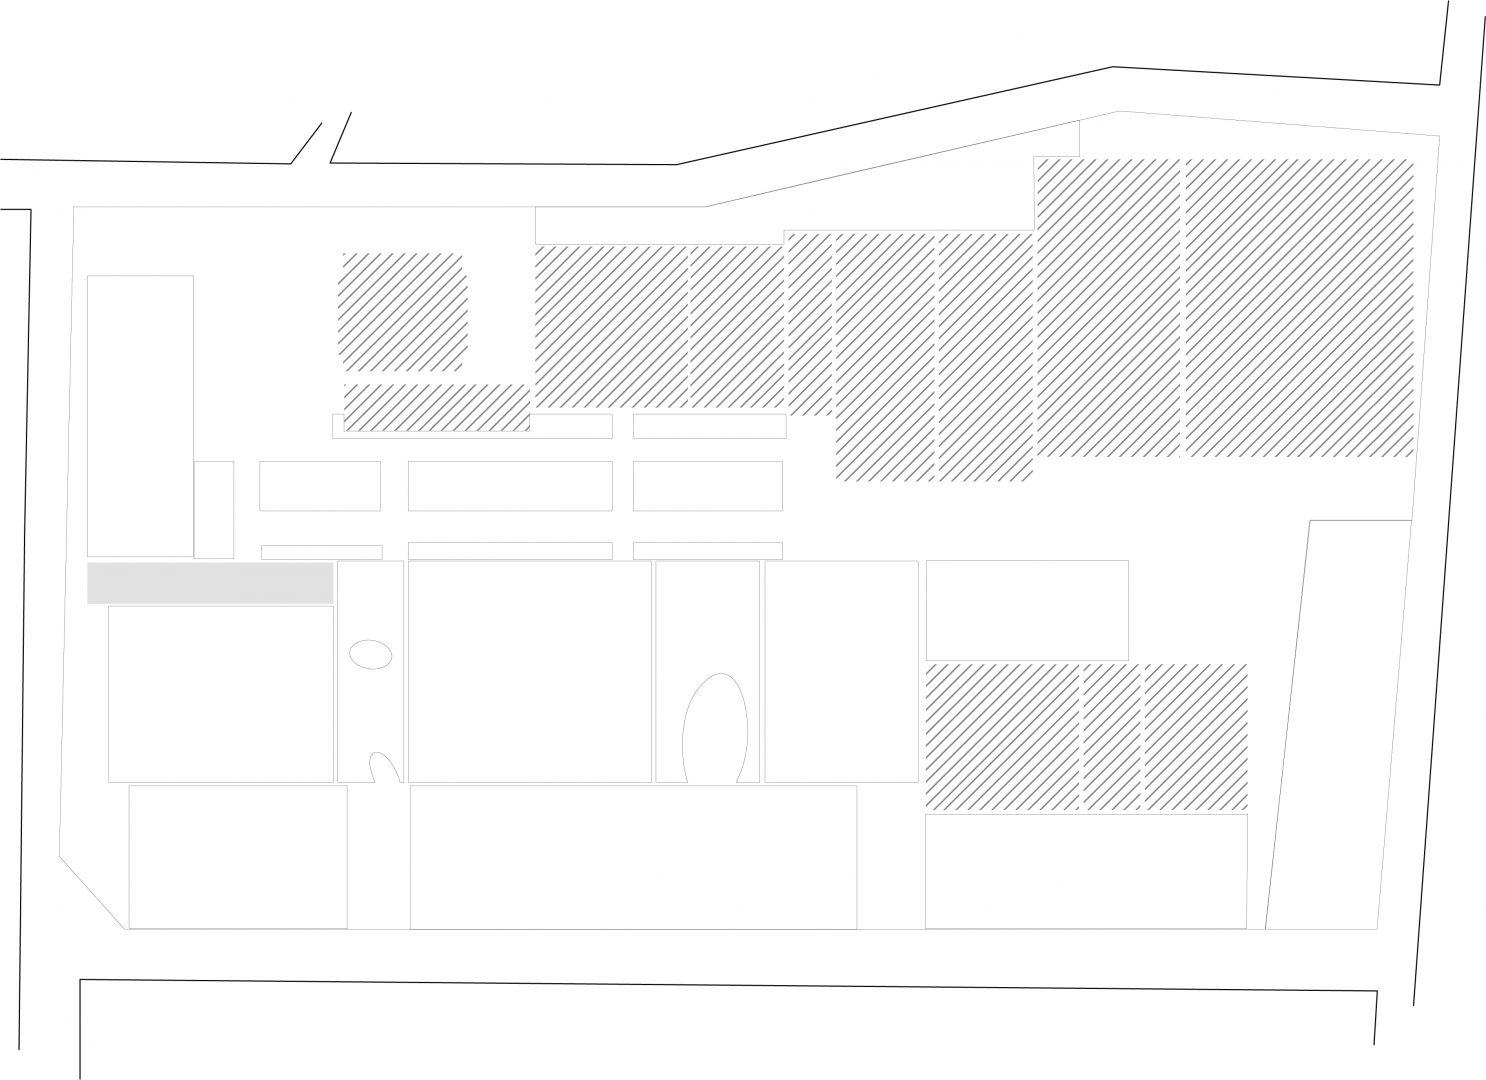 atelier-522-Messe-Dornbirn-2